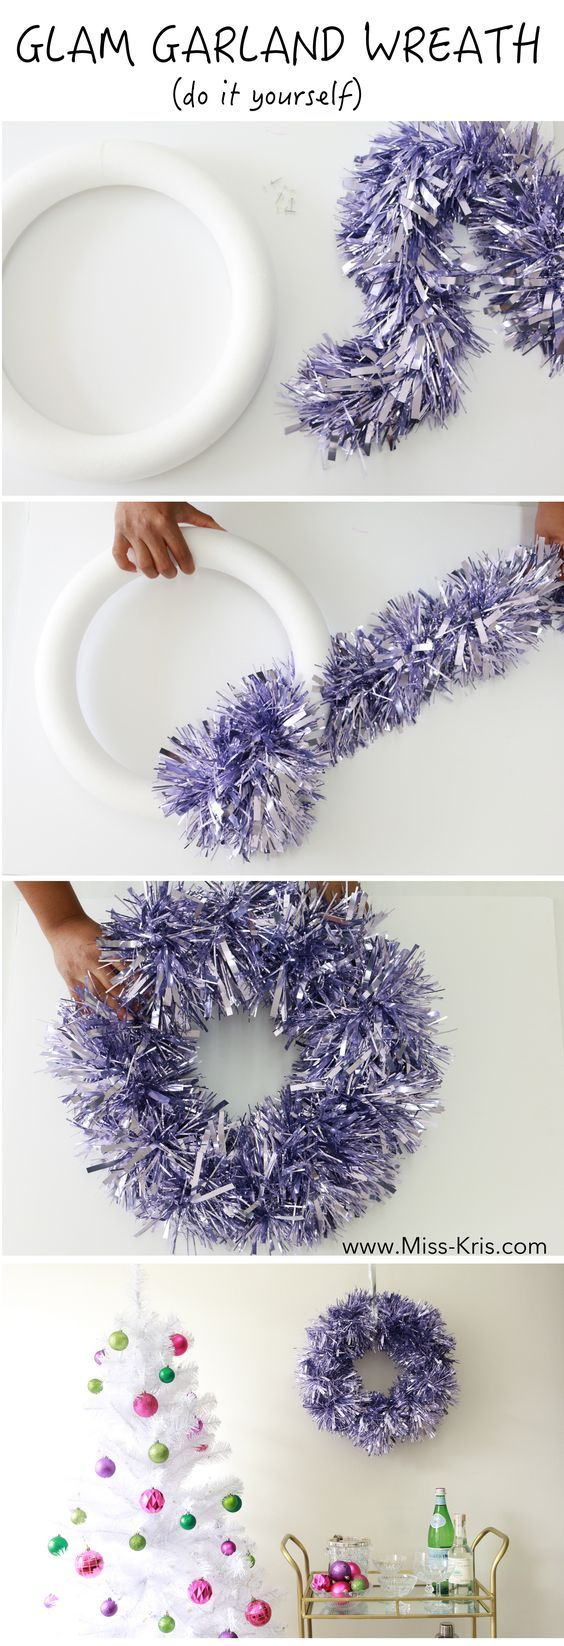 DIY Christmas Wreath by Miss Kris. Full Post here -> http://miss-kris.com/2015/12/glamgarlandwreath/: